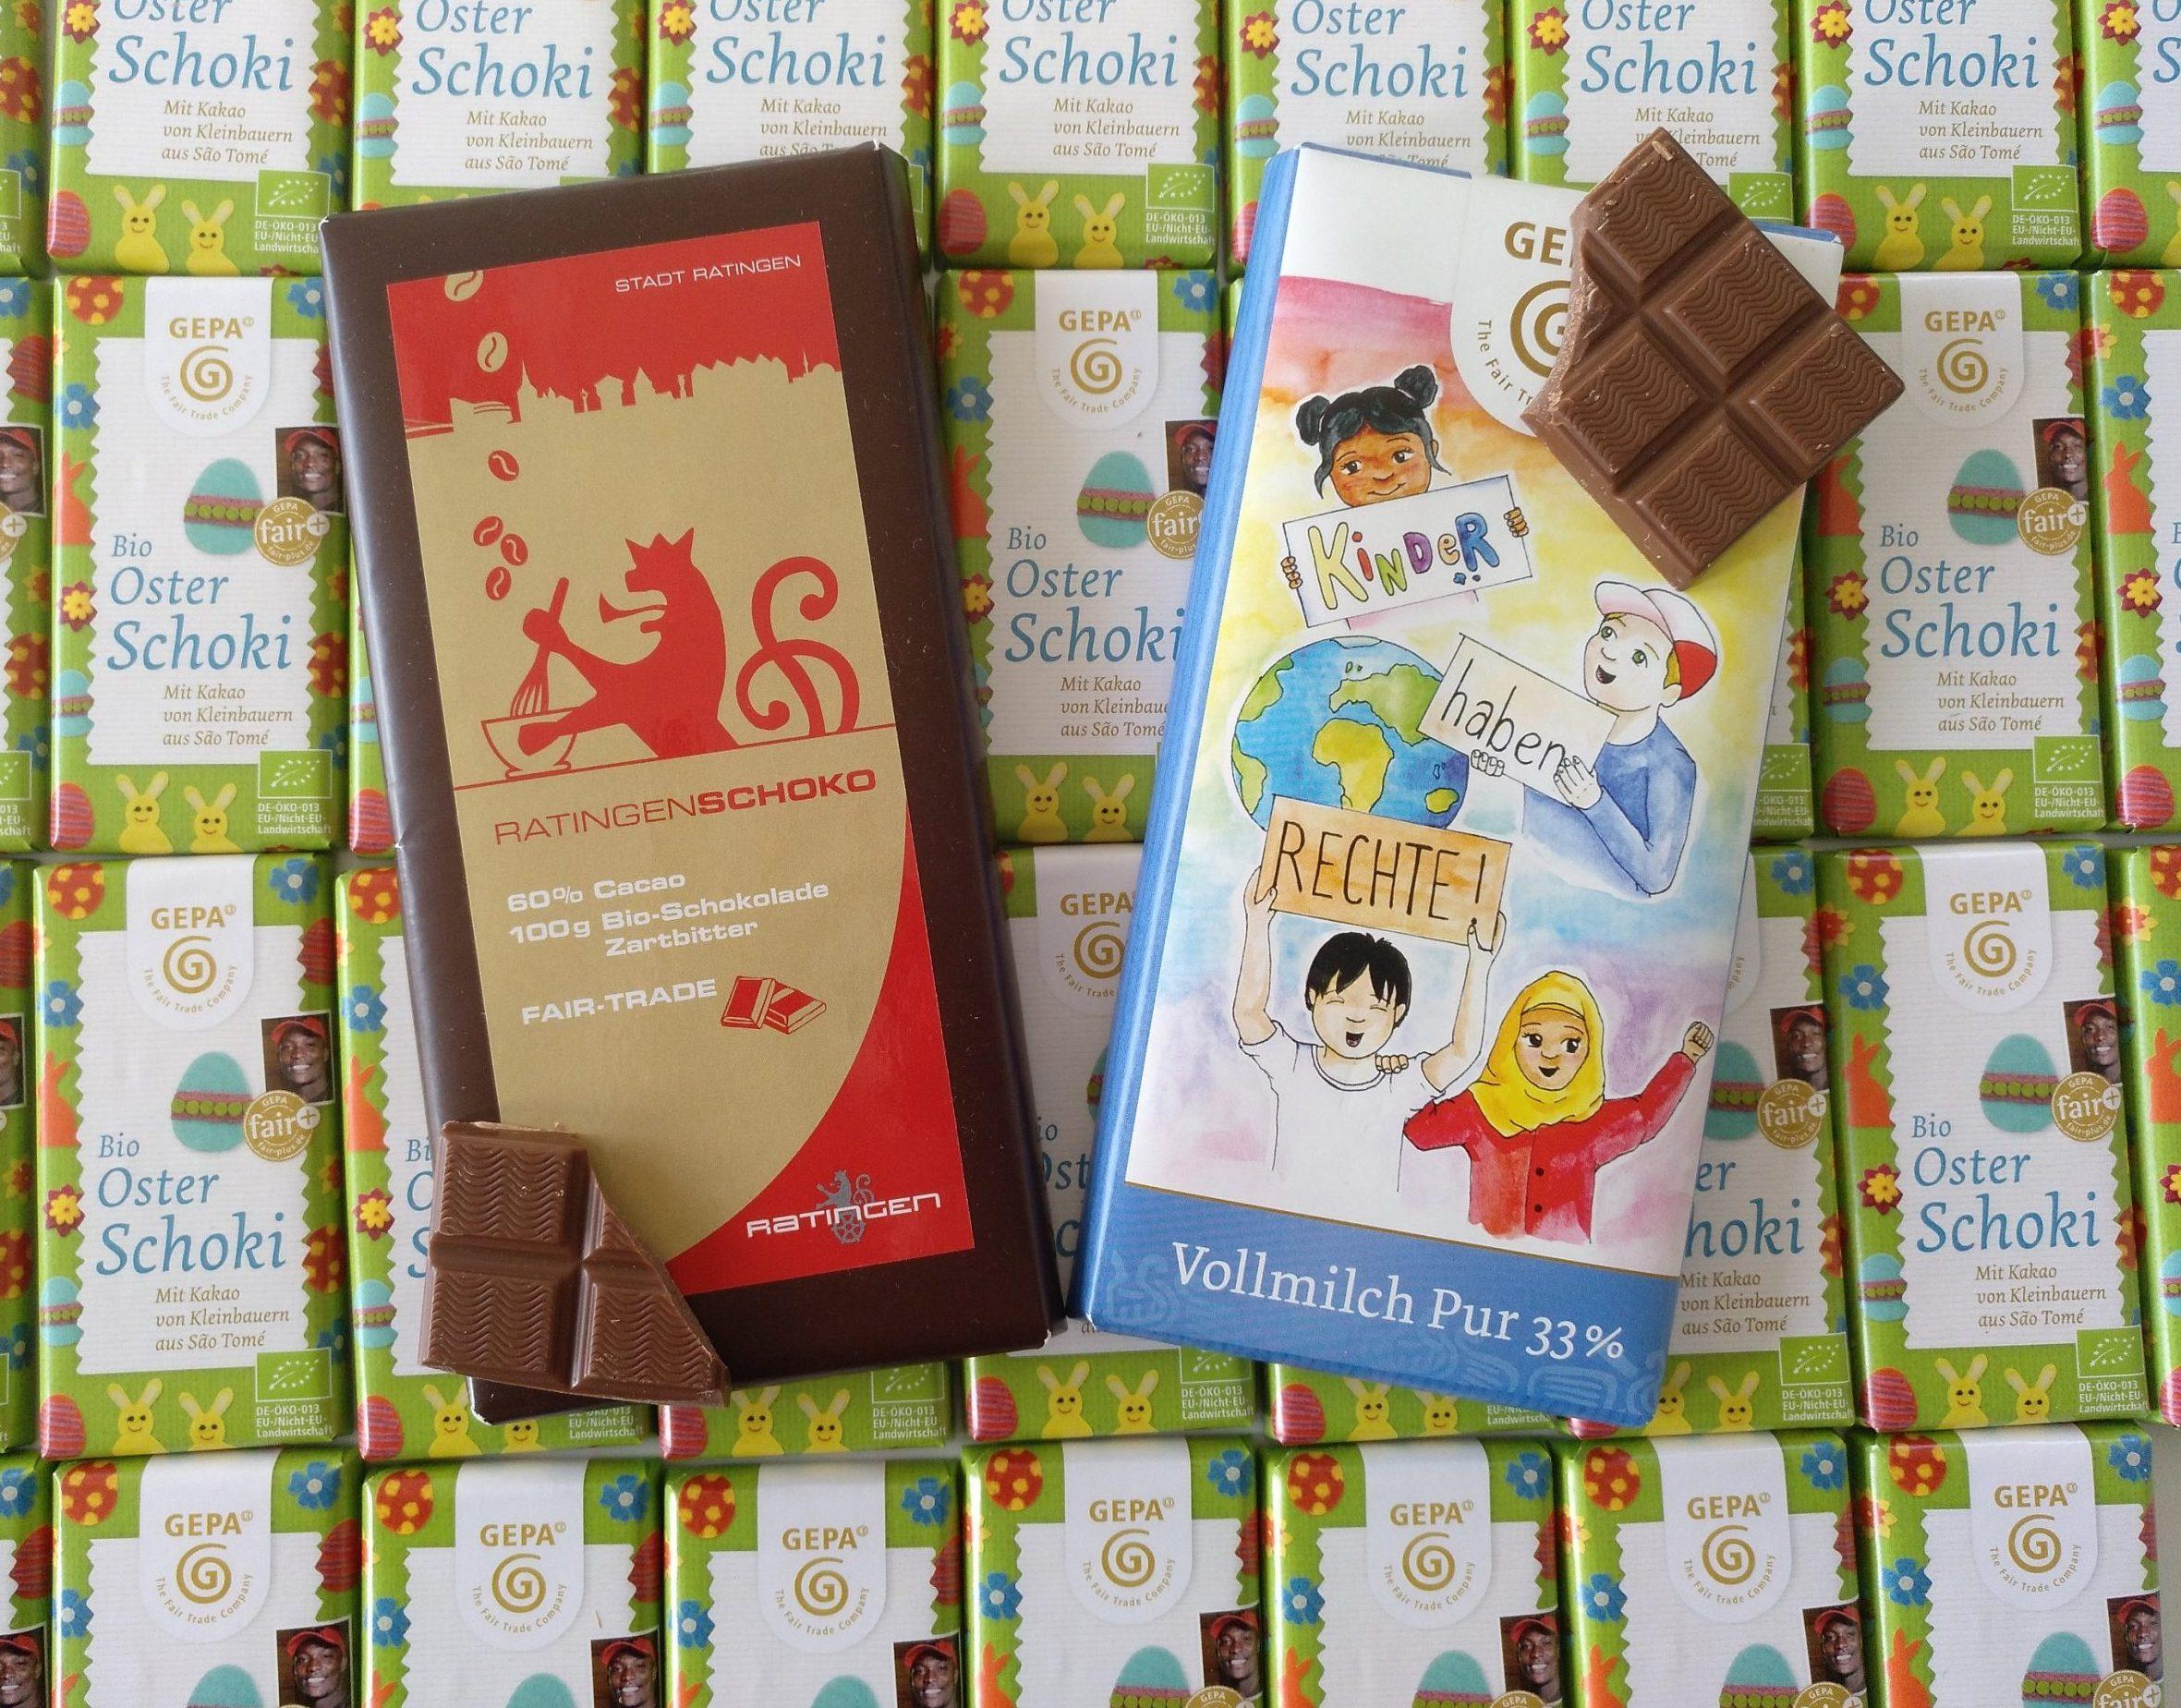 jugendkulturjahr-2020-ratingen-jkj2020-malwettbewerb-cover-faire-trade-schokolade